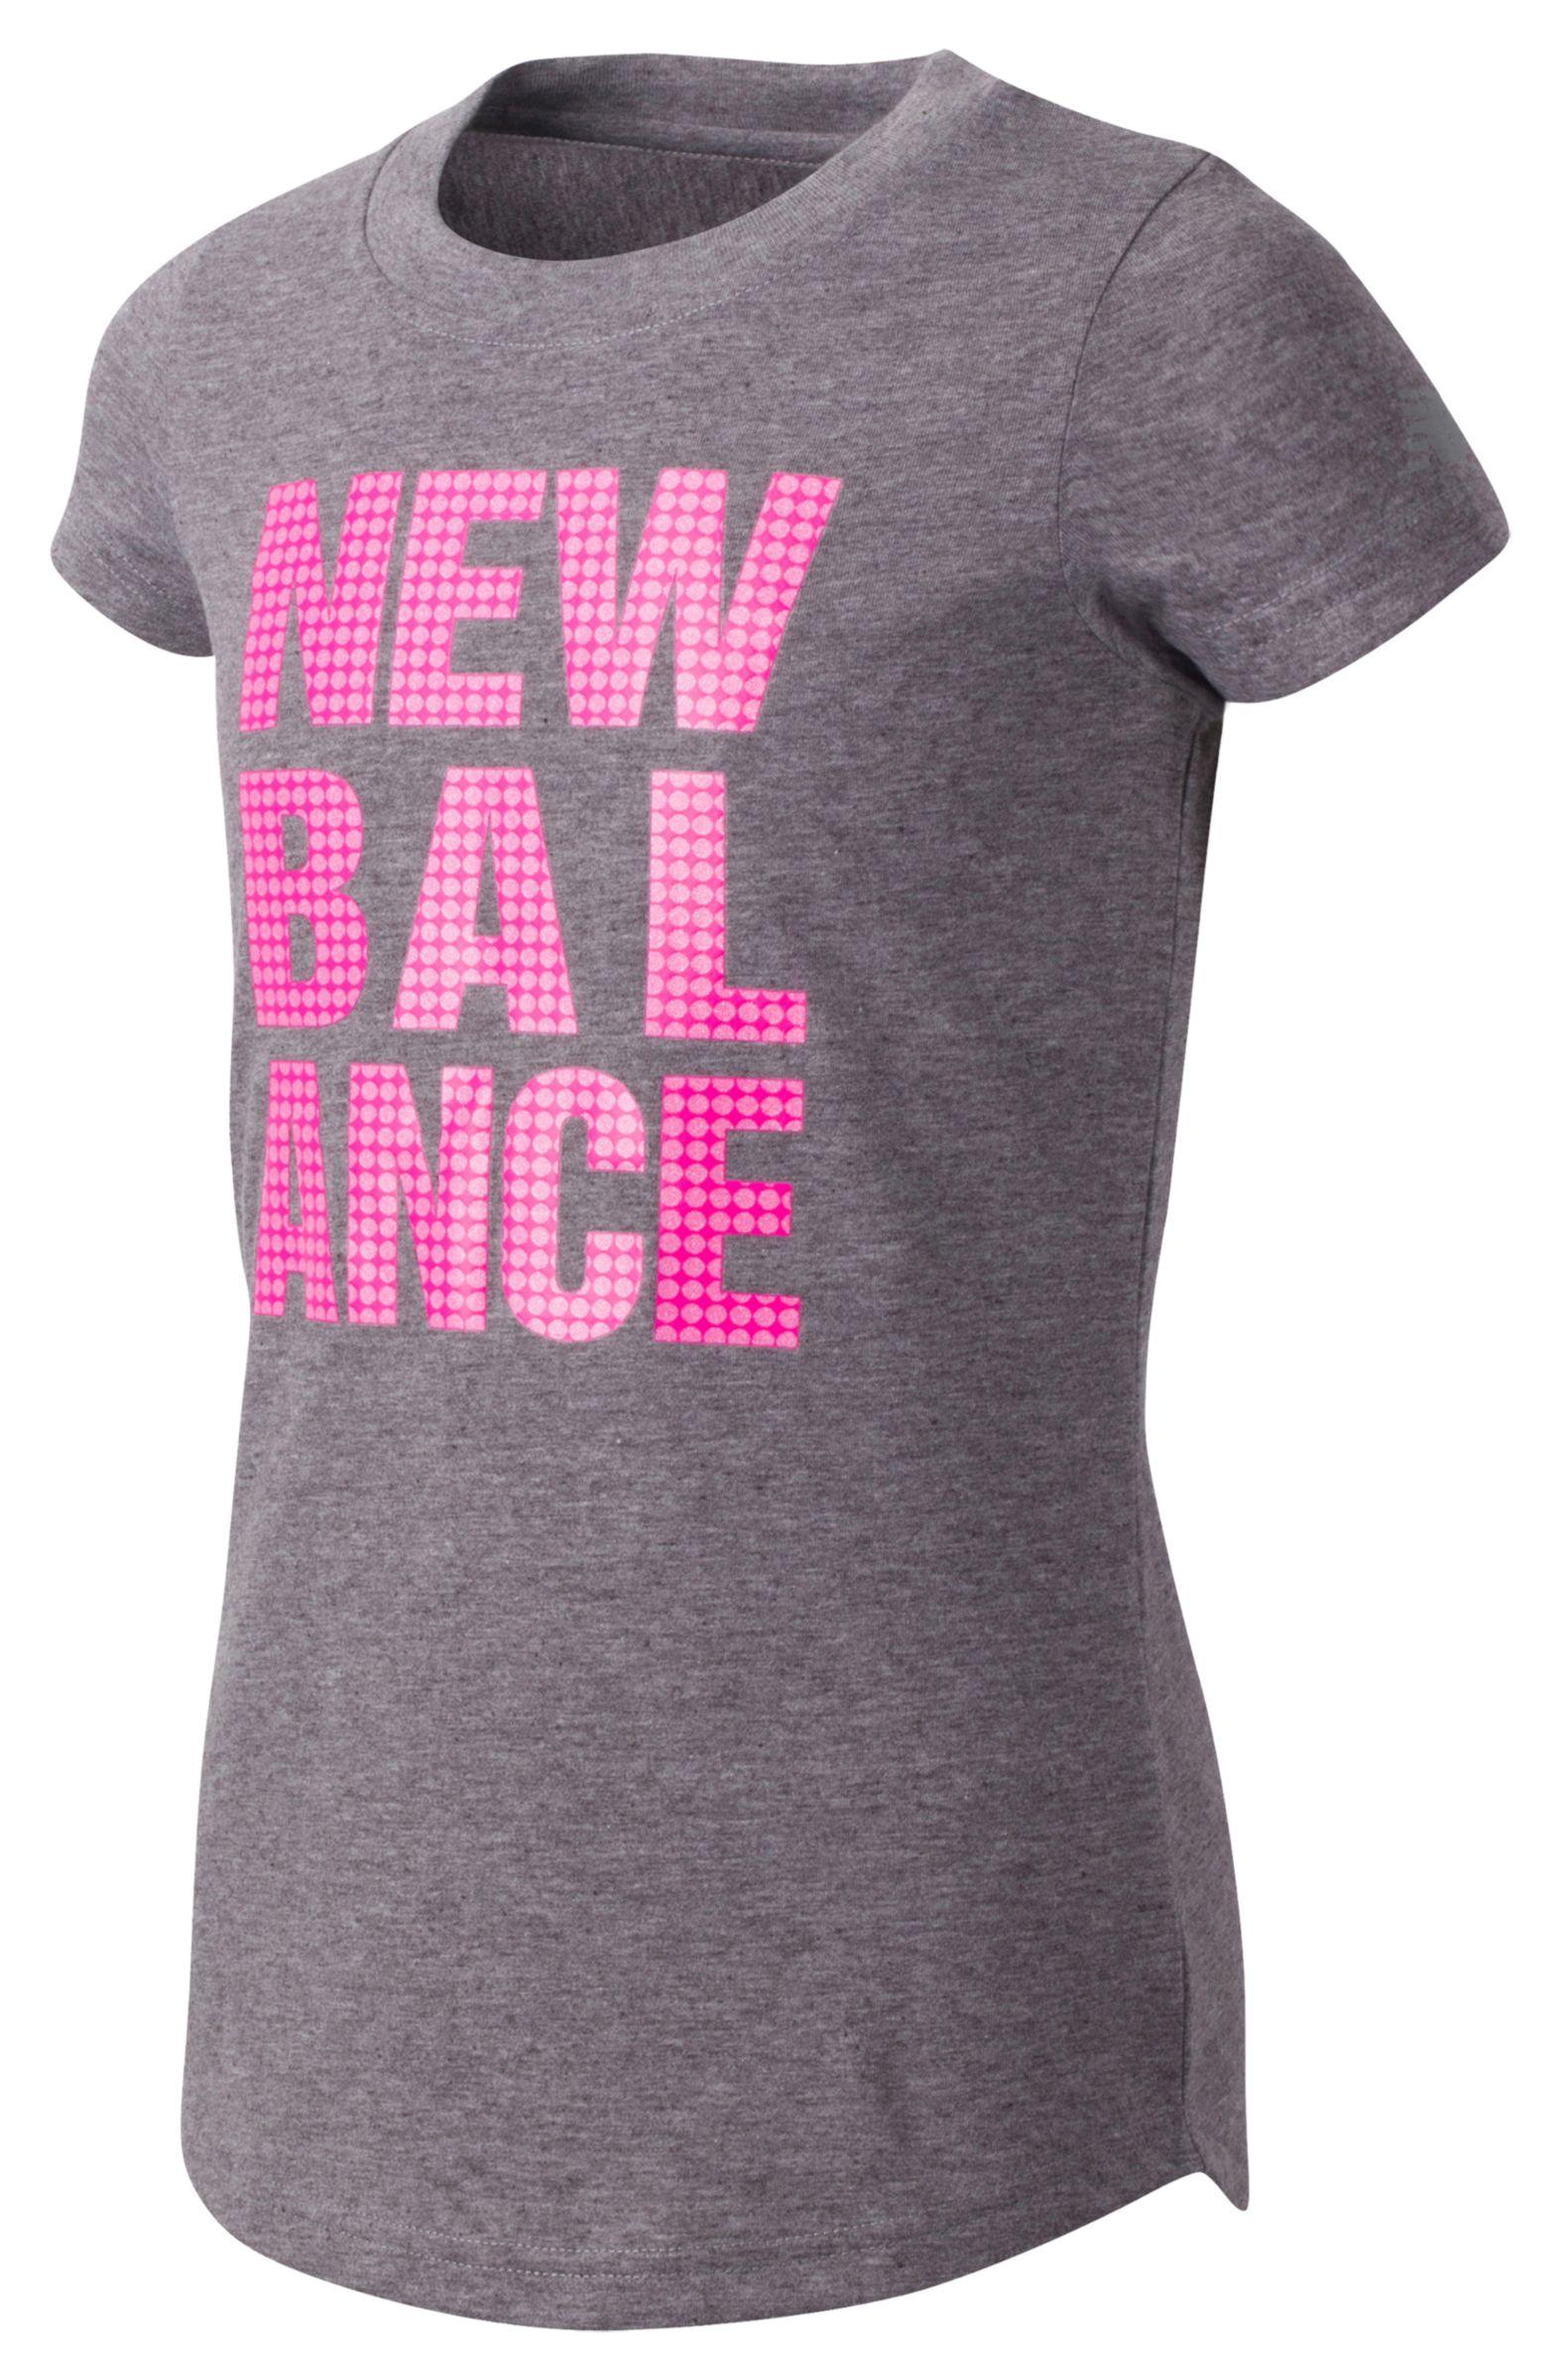 New Balance Girls Short Sleeve Graphic Tee Grey